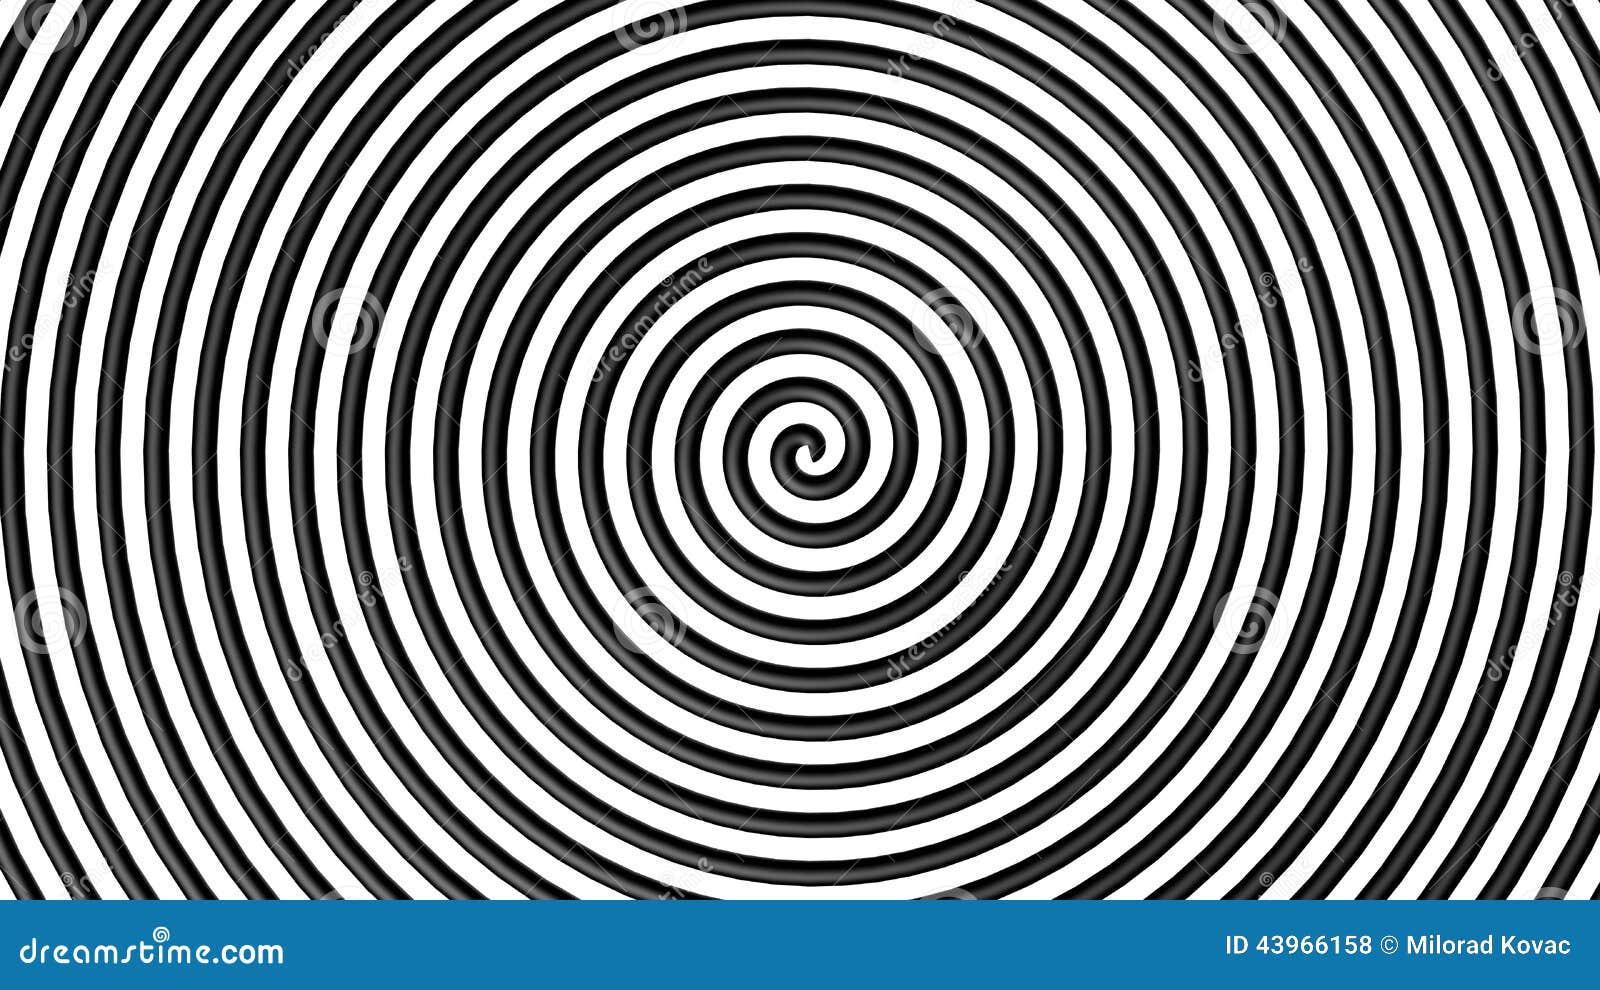 Black And White Hypnotic Circle Stock Illustration  Image: 43966158 - Eiffel Tower Floor Plan